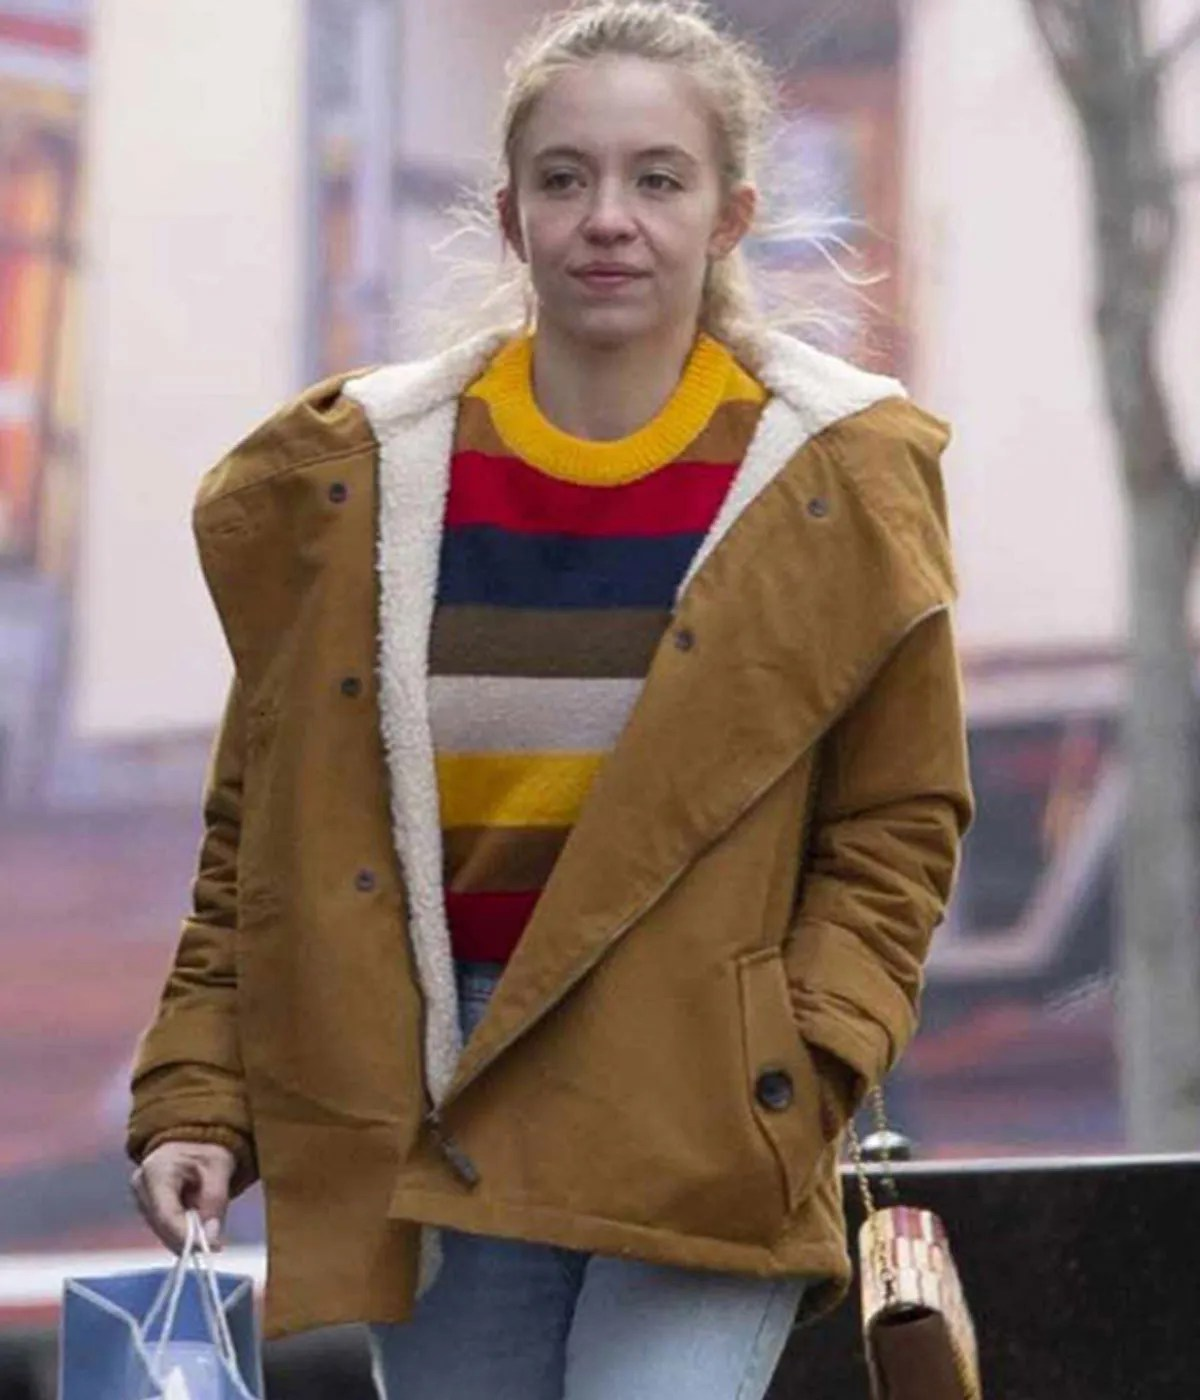 sydney-sweeney-the-voyeurs-jacket